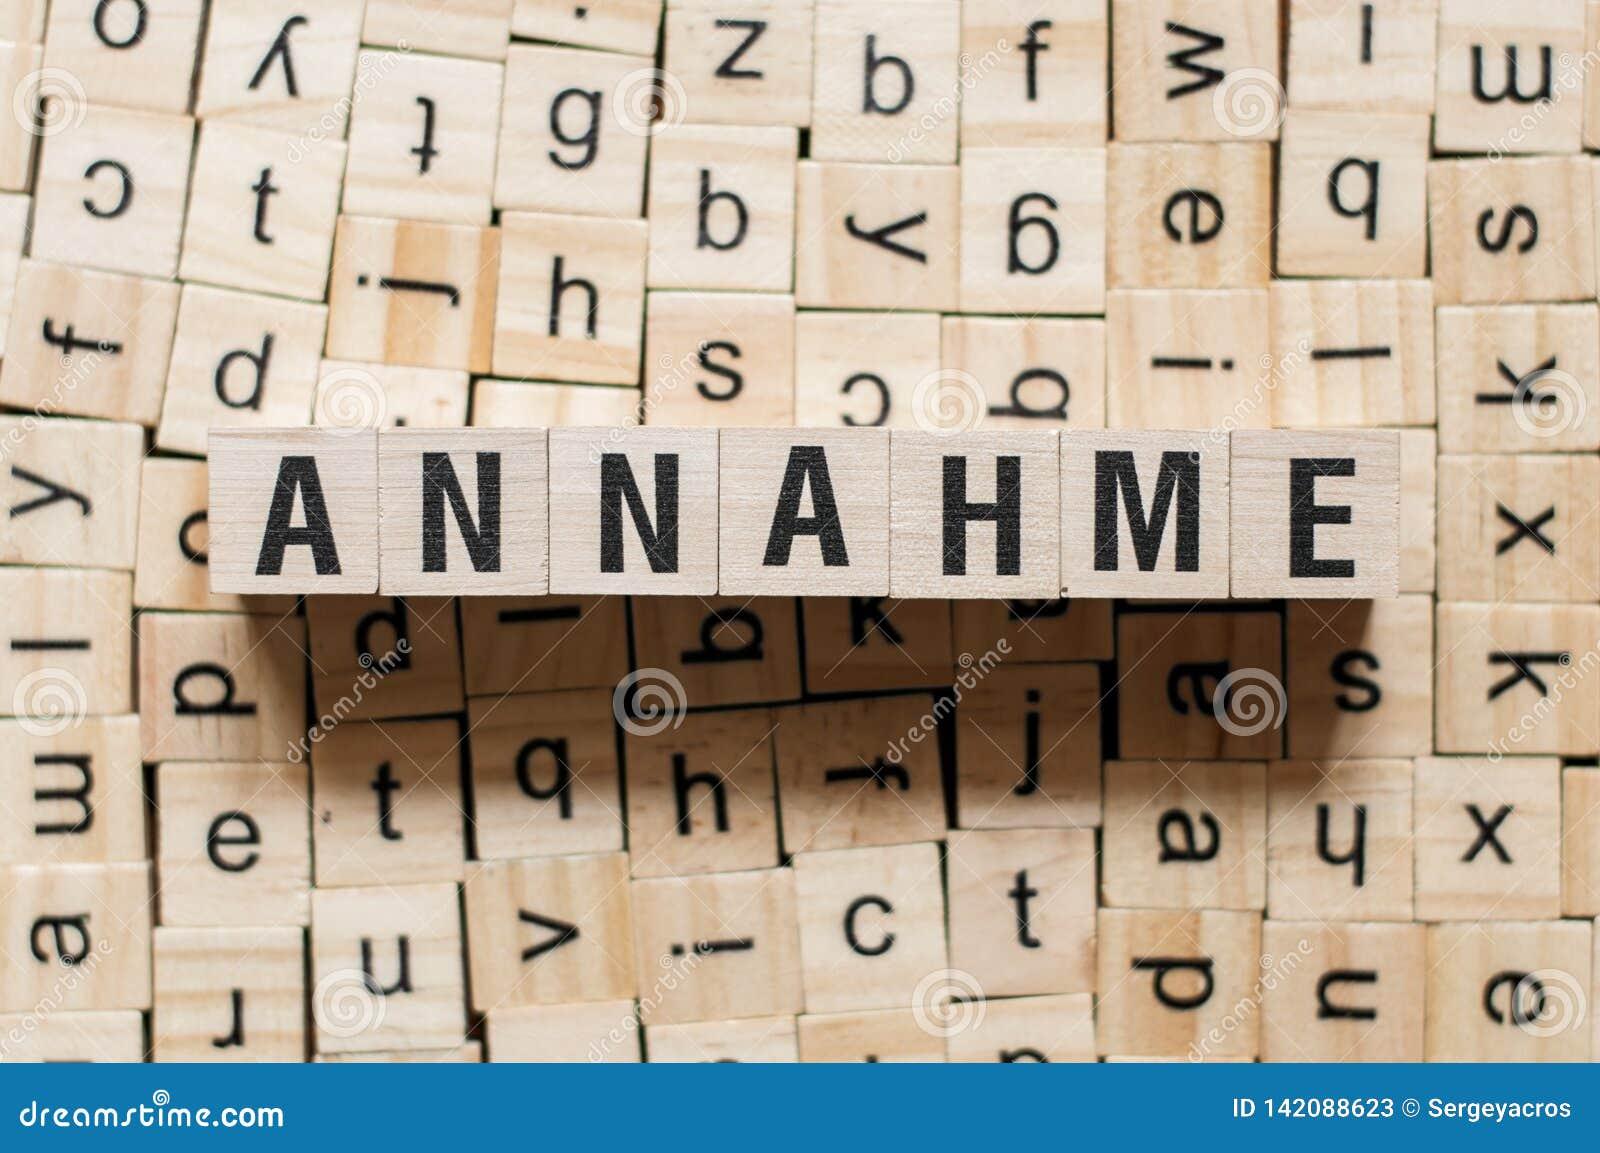 Annahme - word Adoption on german language,word concept